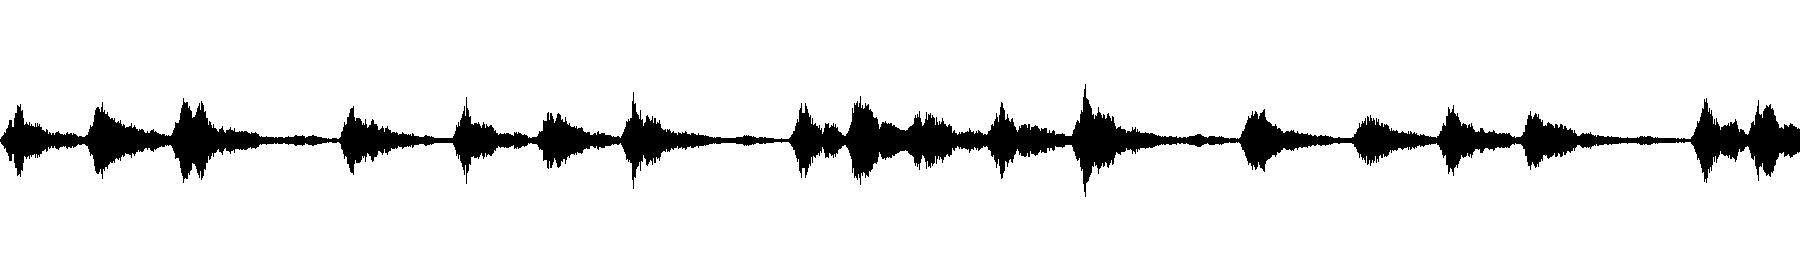 jackboys dark synth chords   125bpm   ebmin